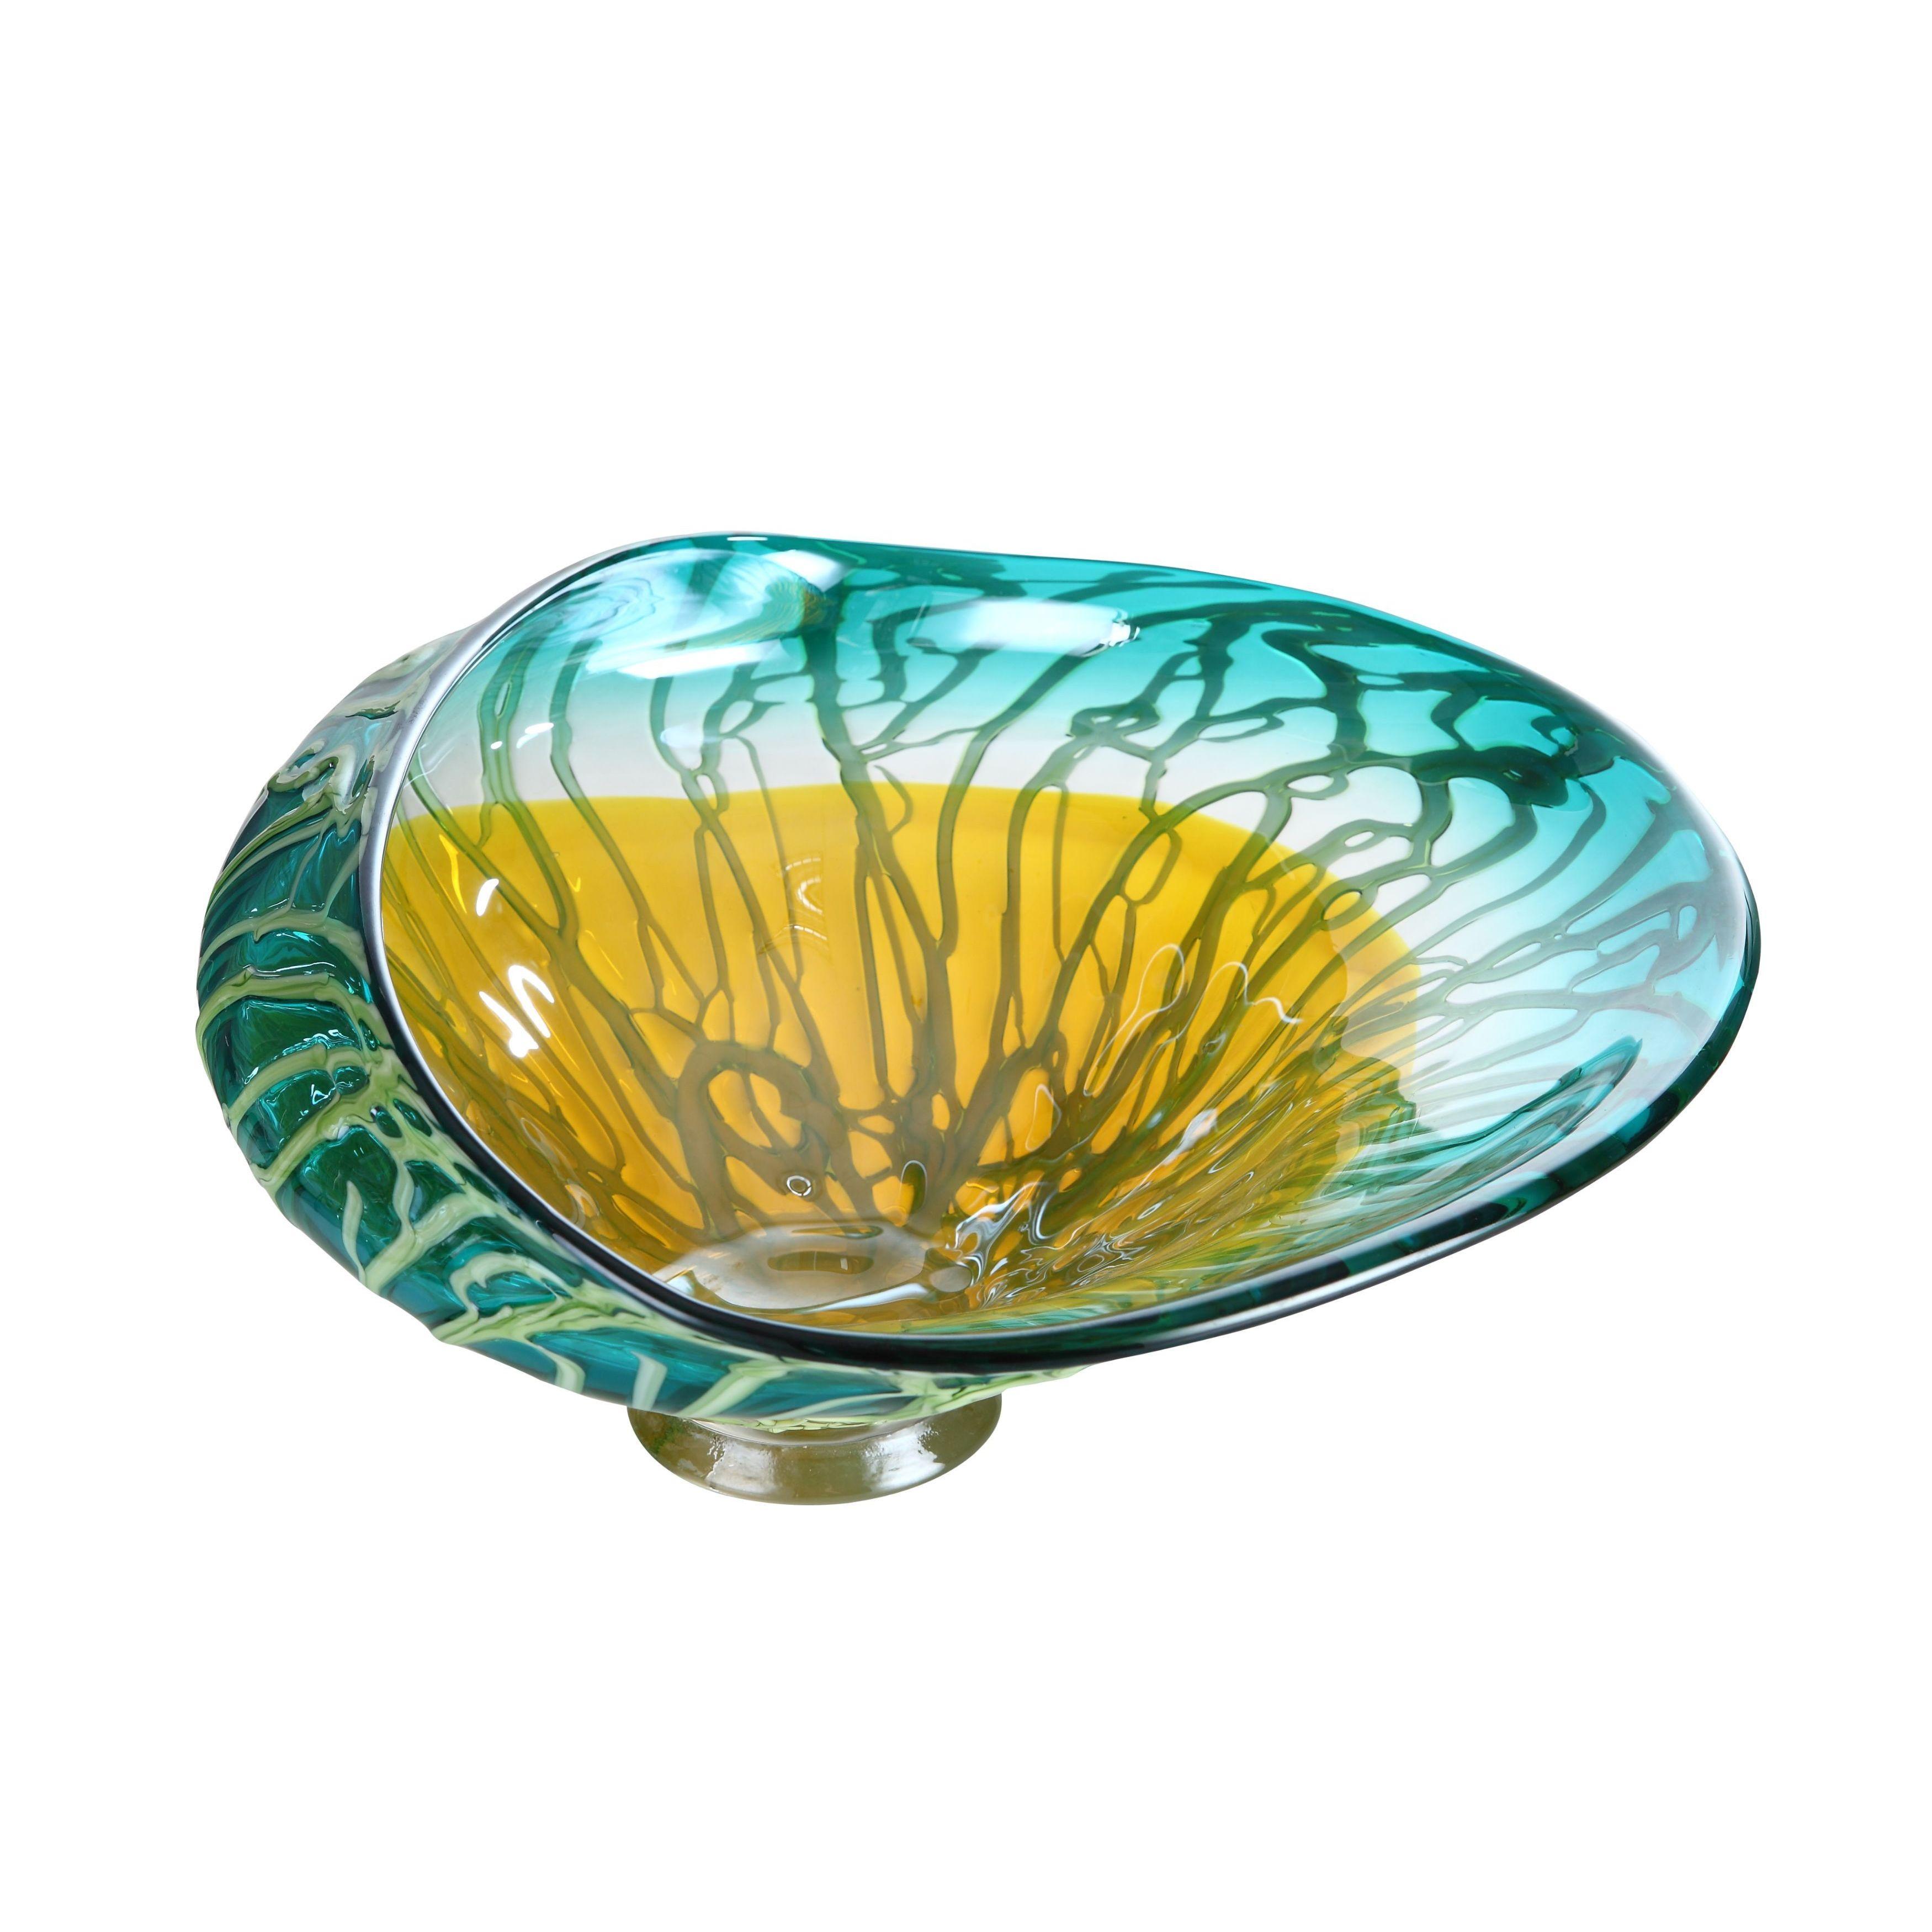 Glass Art Gallery   Shop our Best Home Goods Deals Online at ...